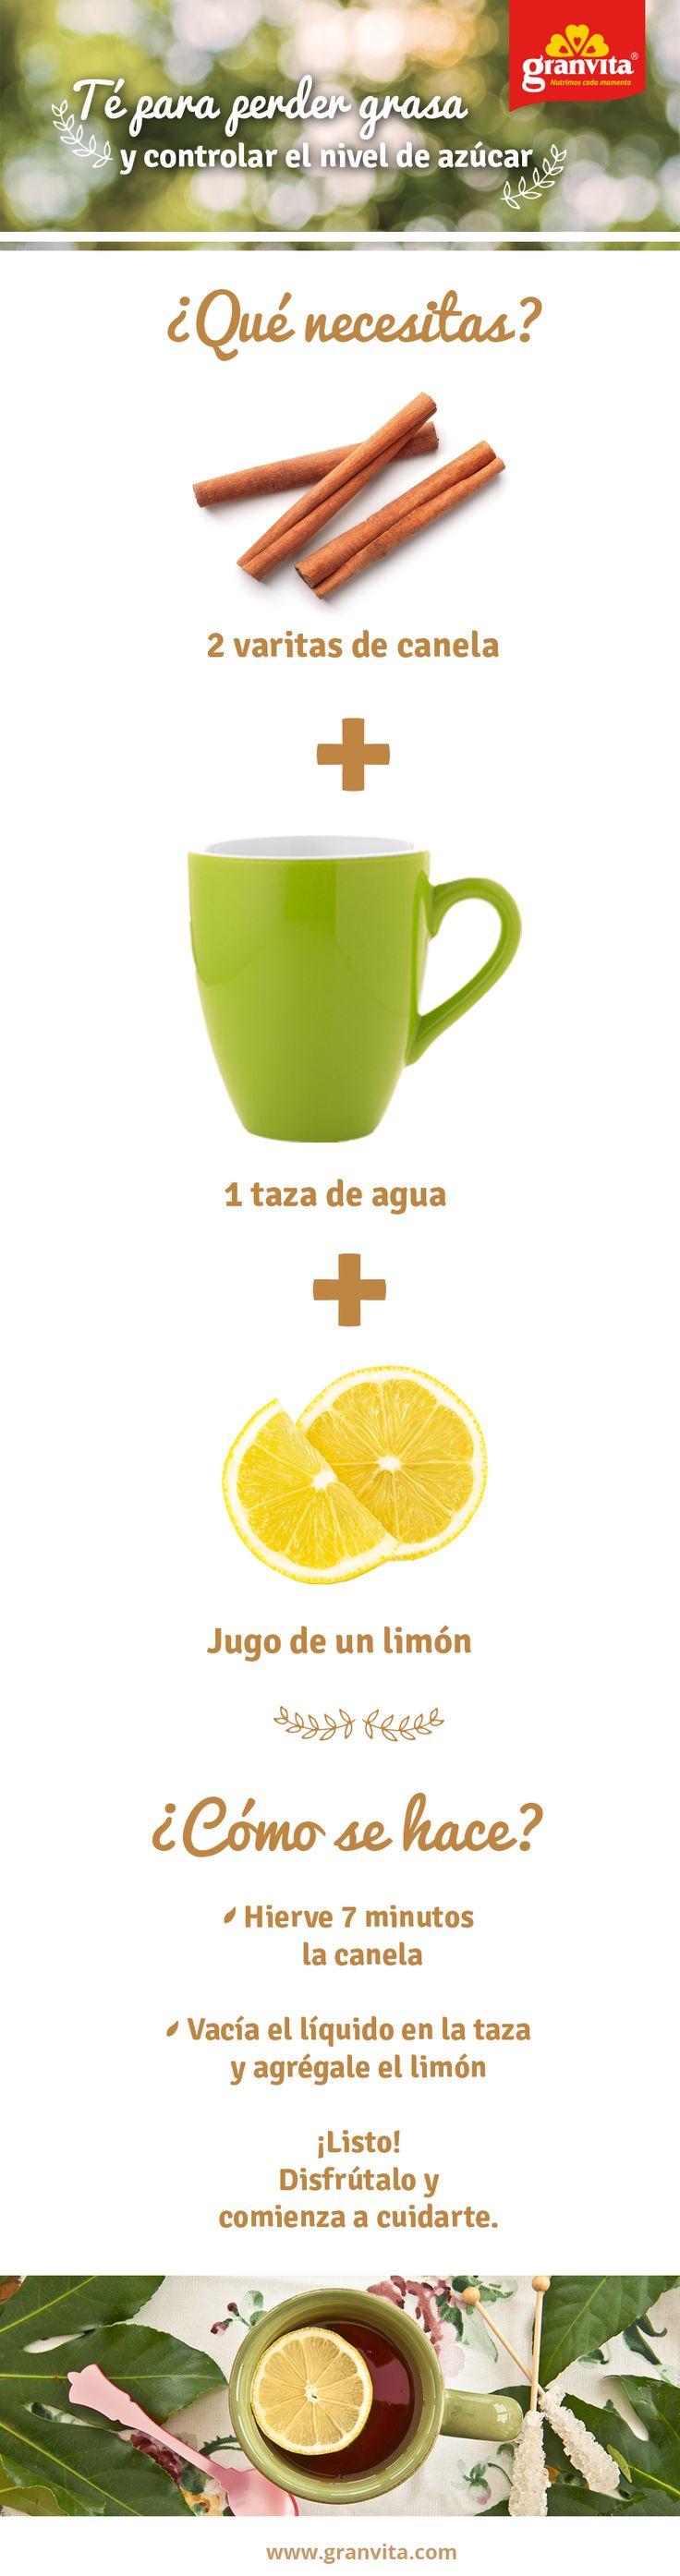 Empezar a controlar tu nivel de azúcar es tan fácil como hacer un té, ¡prueba esto!